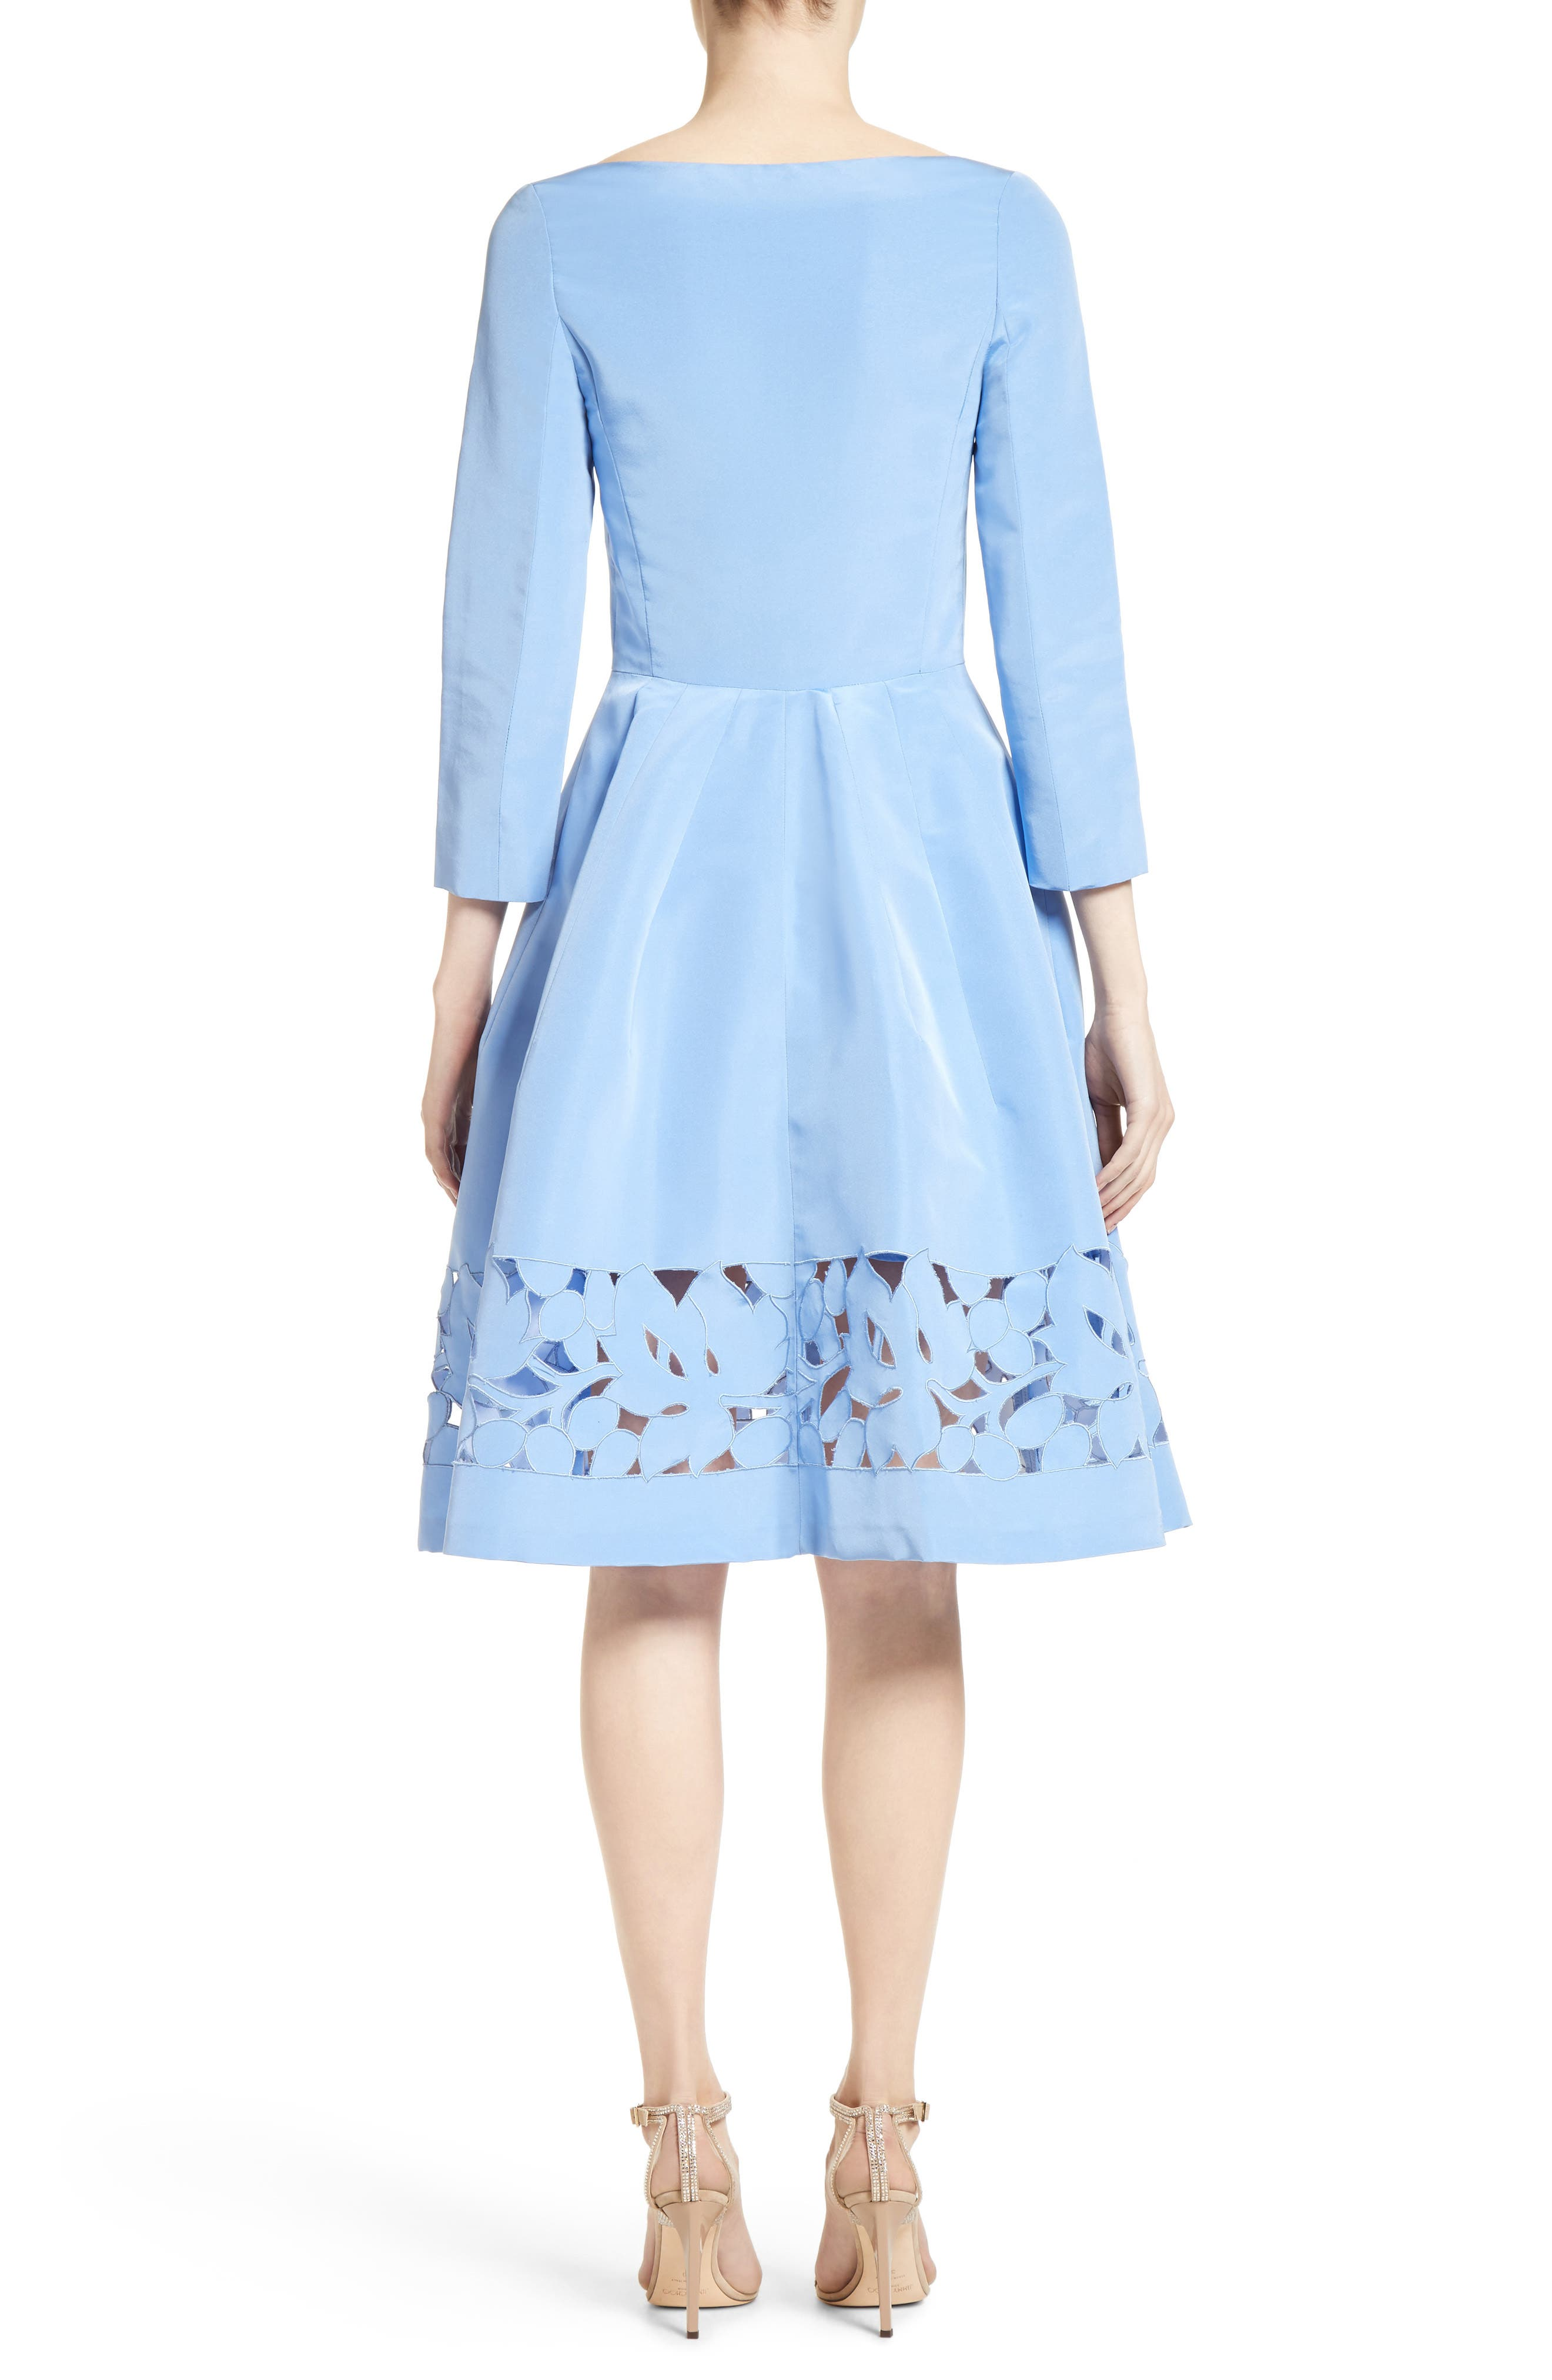 Carolina Herrerra Laser Cut Eyelet Button Front Dress,                             Alternate thumbnail 2, color,                             400